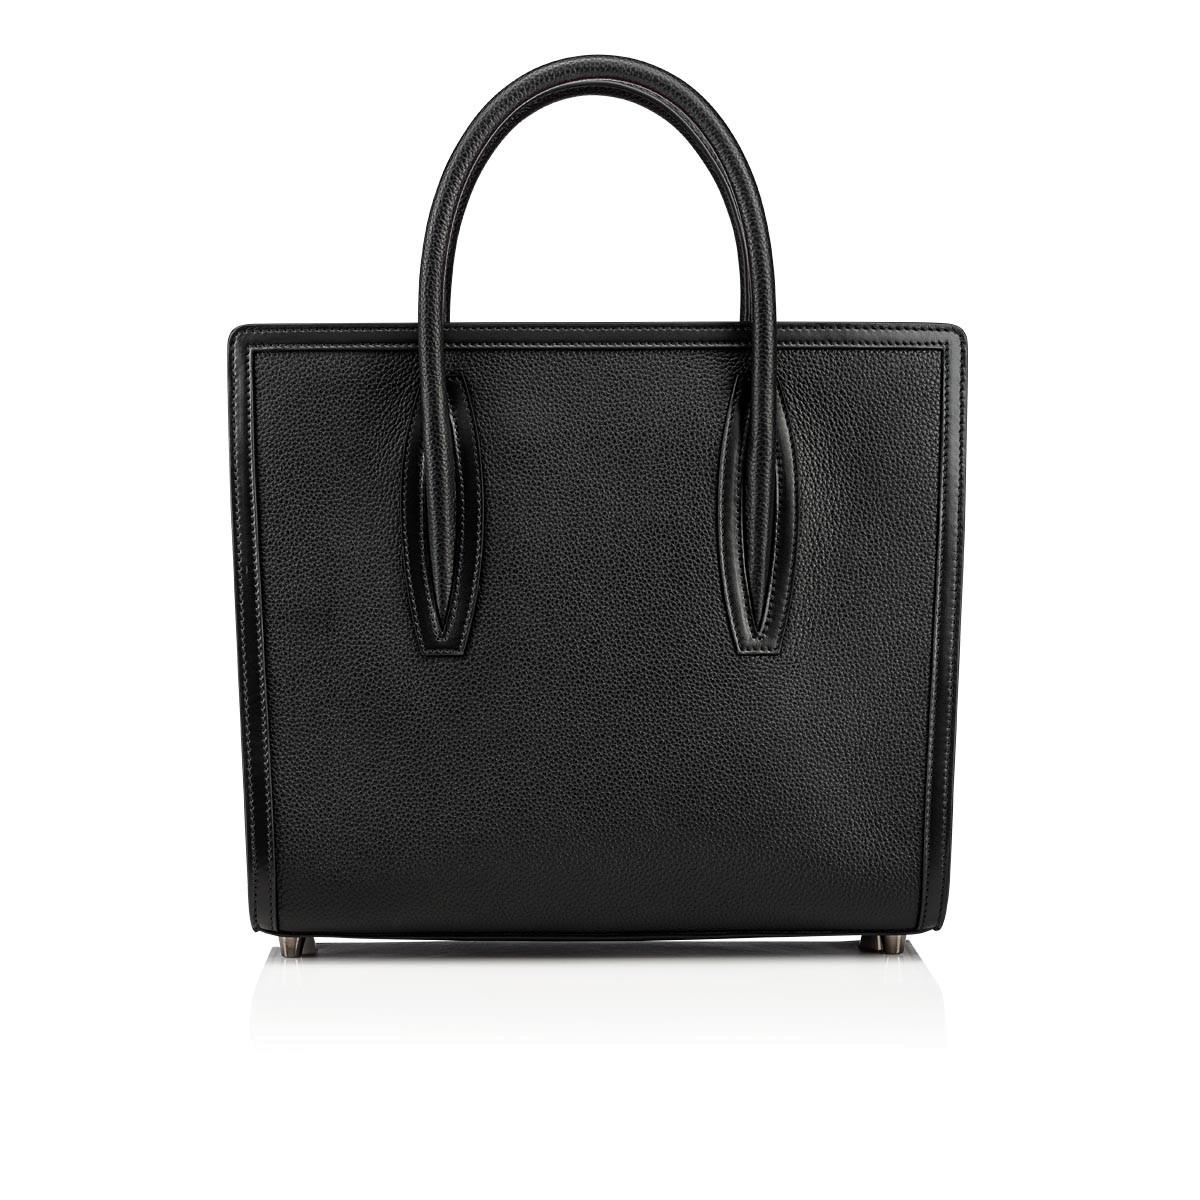 Bags - Paloma S - Christian Louboutin